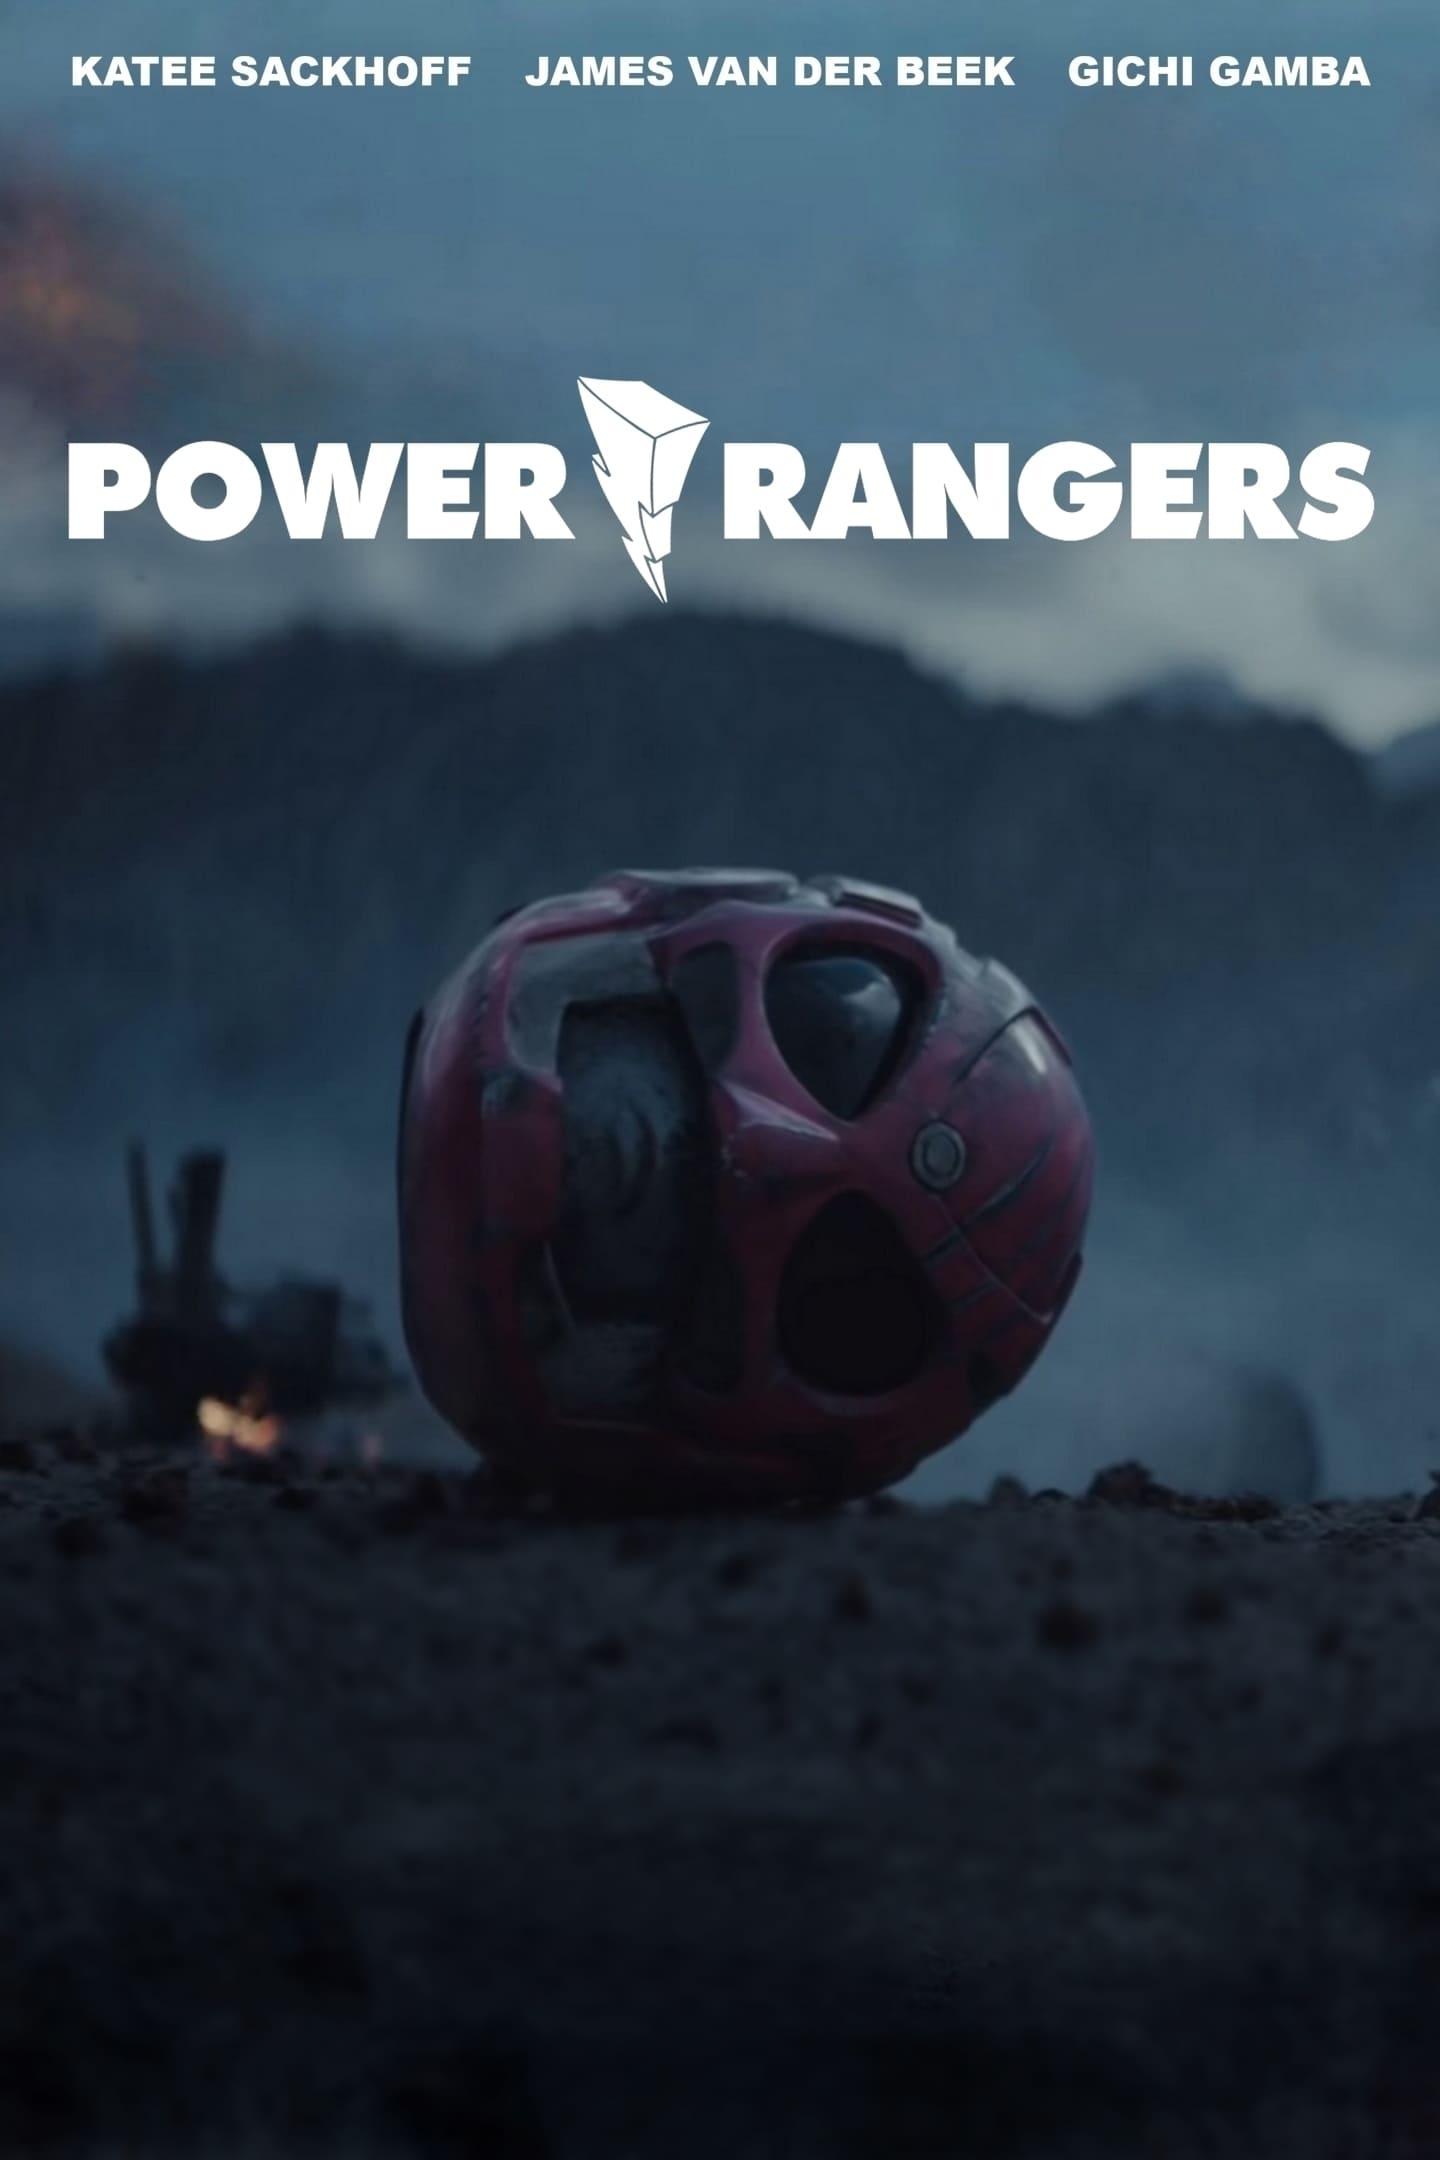 Power/Rangers (2015)